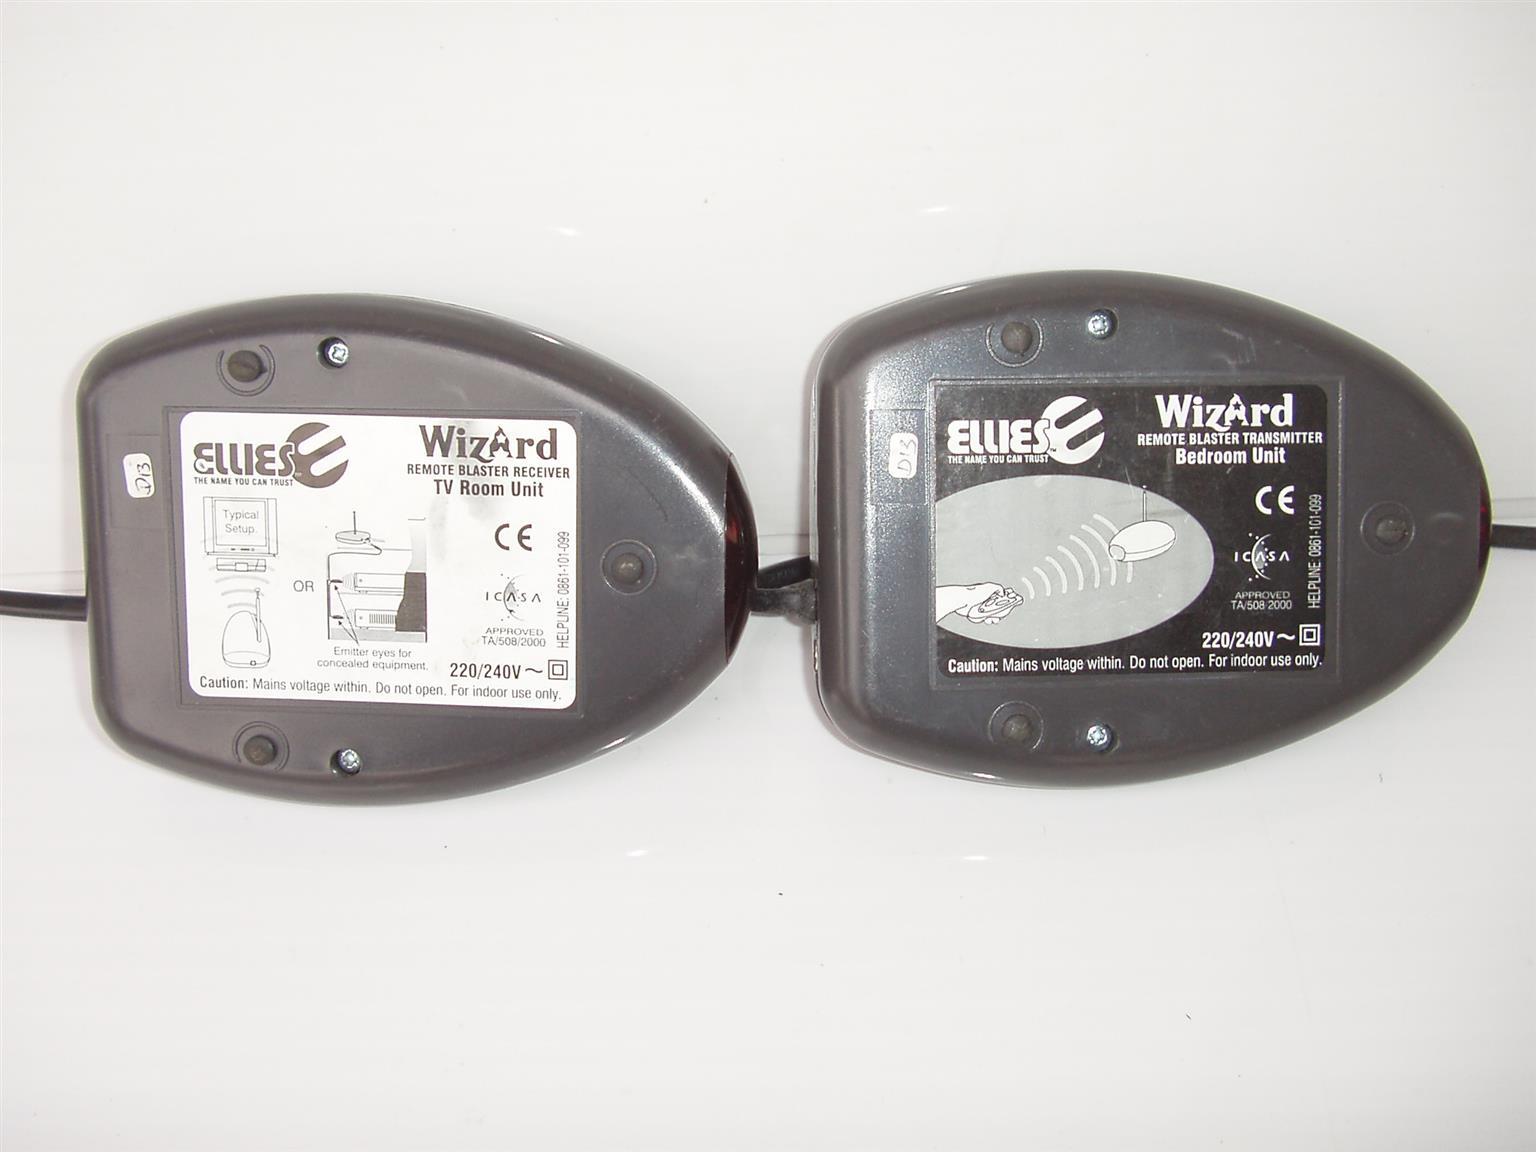 Remote blaster - set -  by Ellies